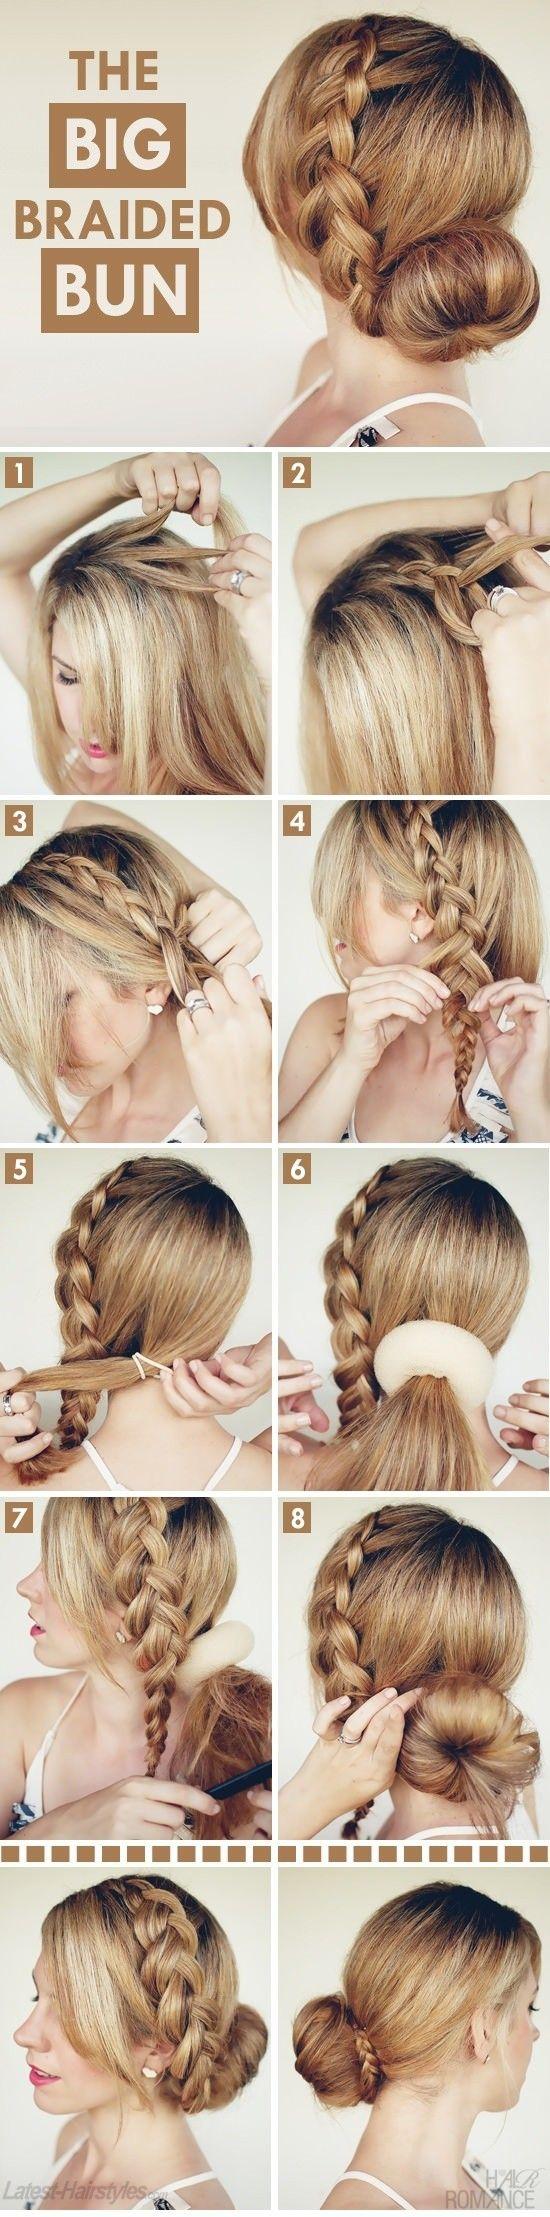 Great DIY braided bun!